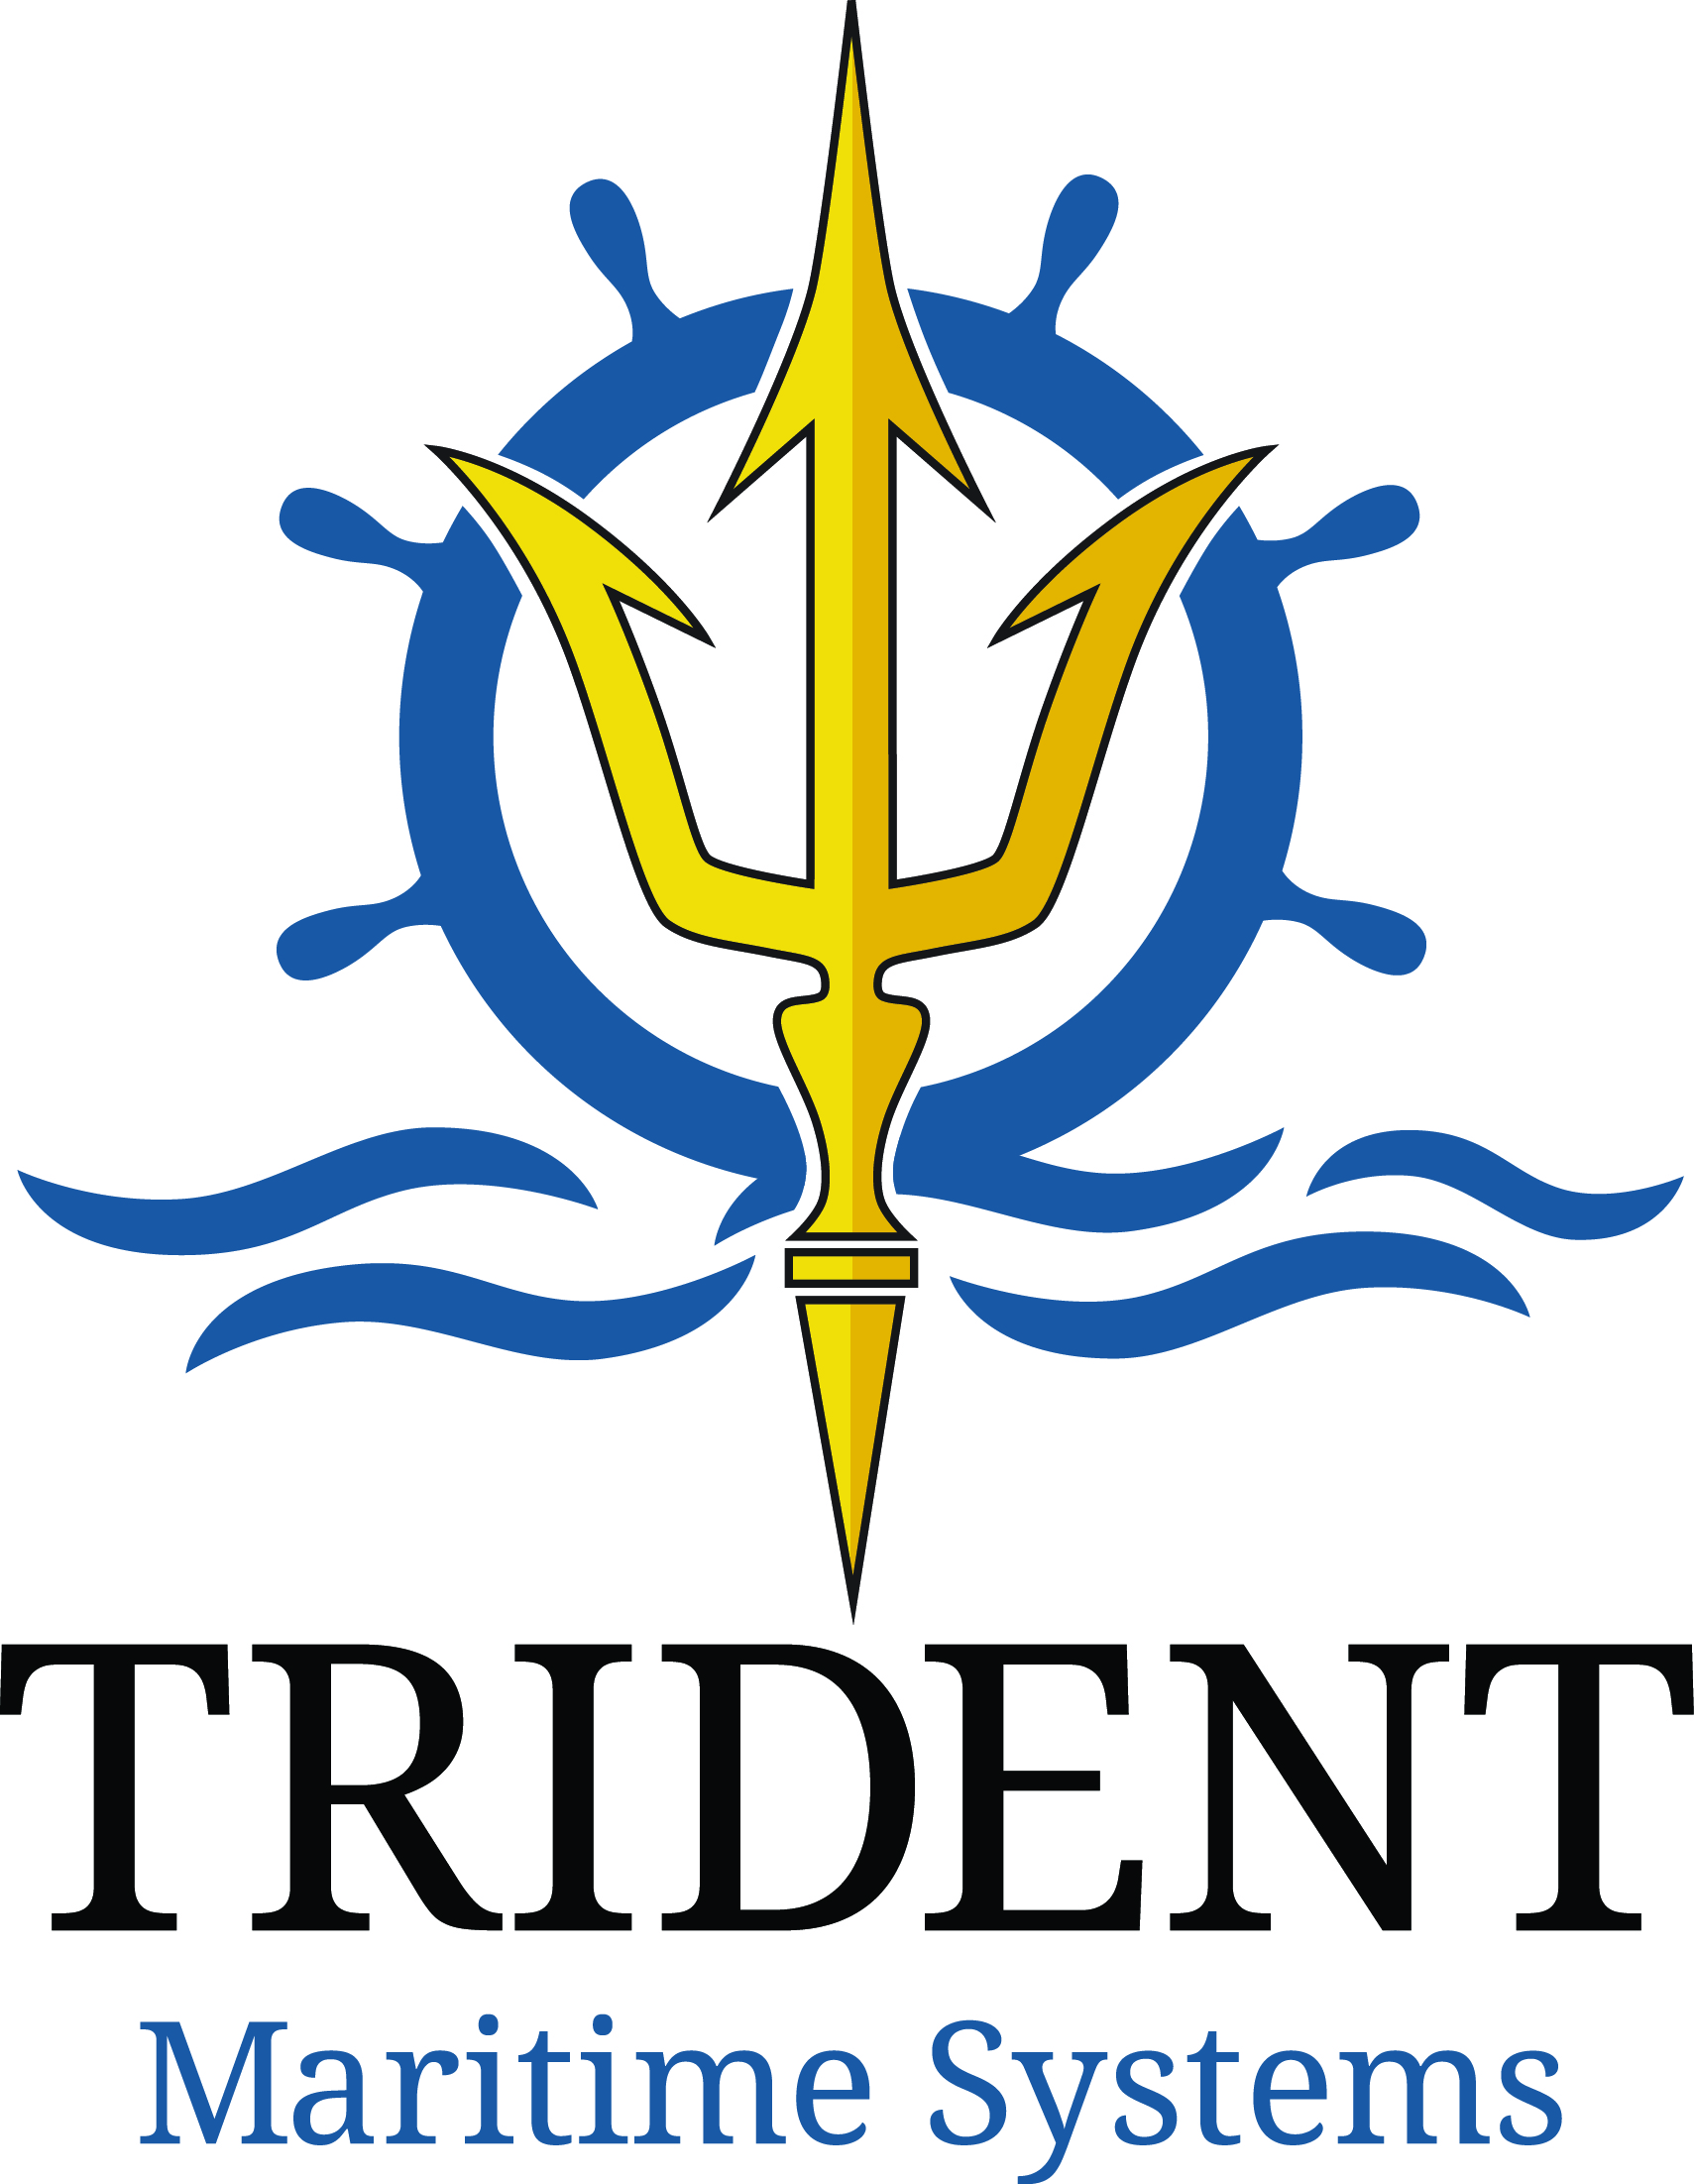 https://www.navalsubleague.org/wp-content/uploads/2018/08/Trident_Logo.jpg